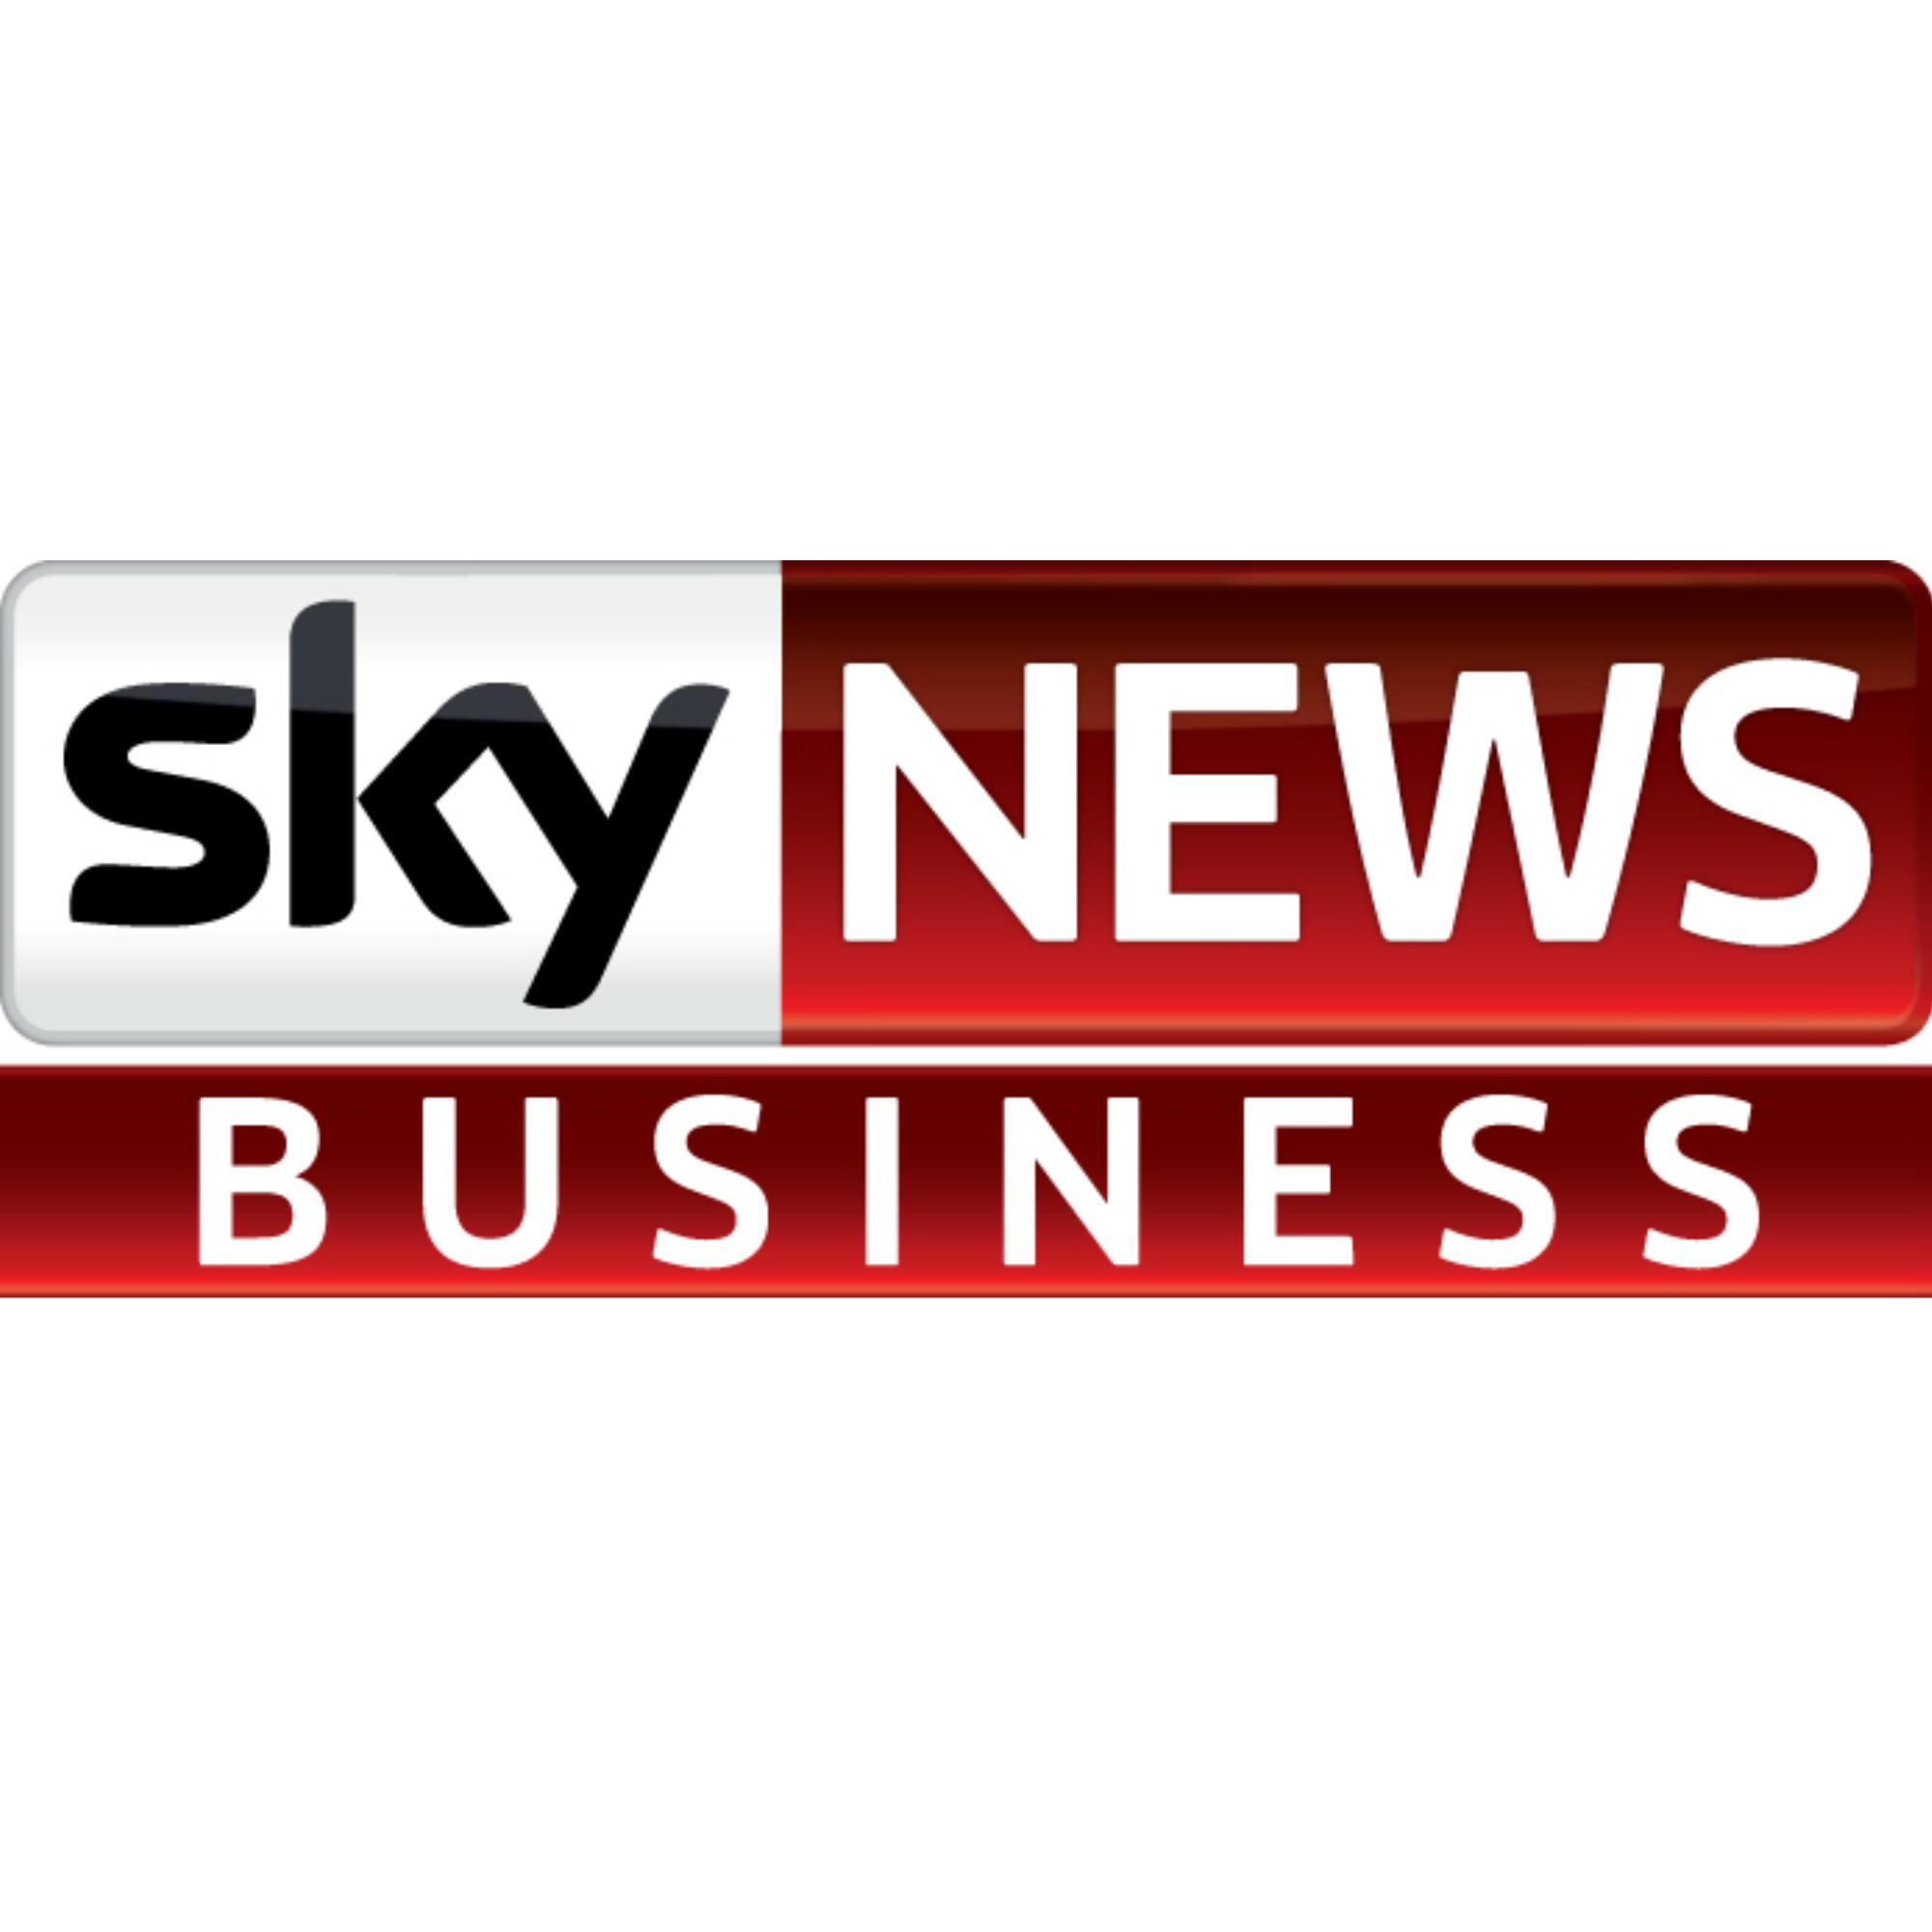 Sky BUsiness news.jpg